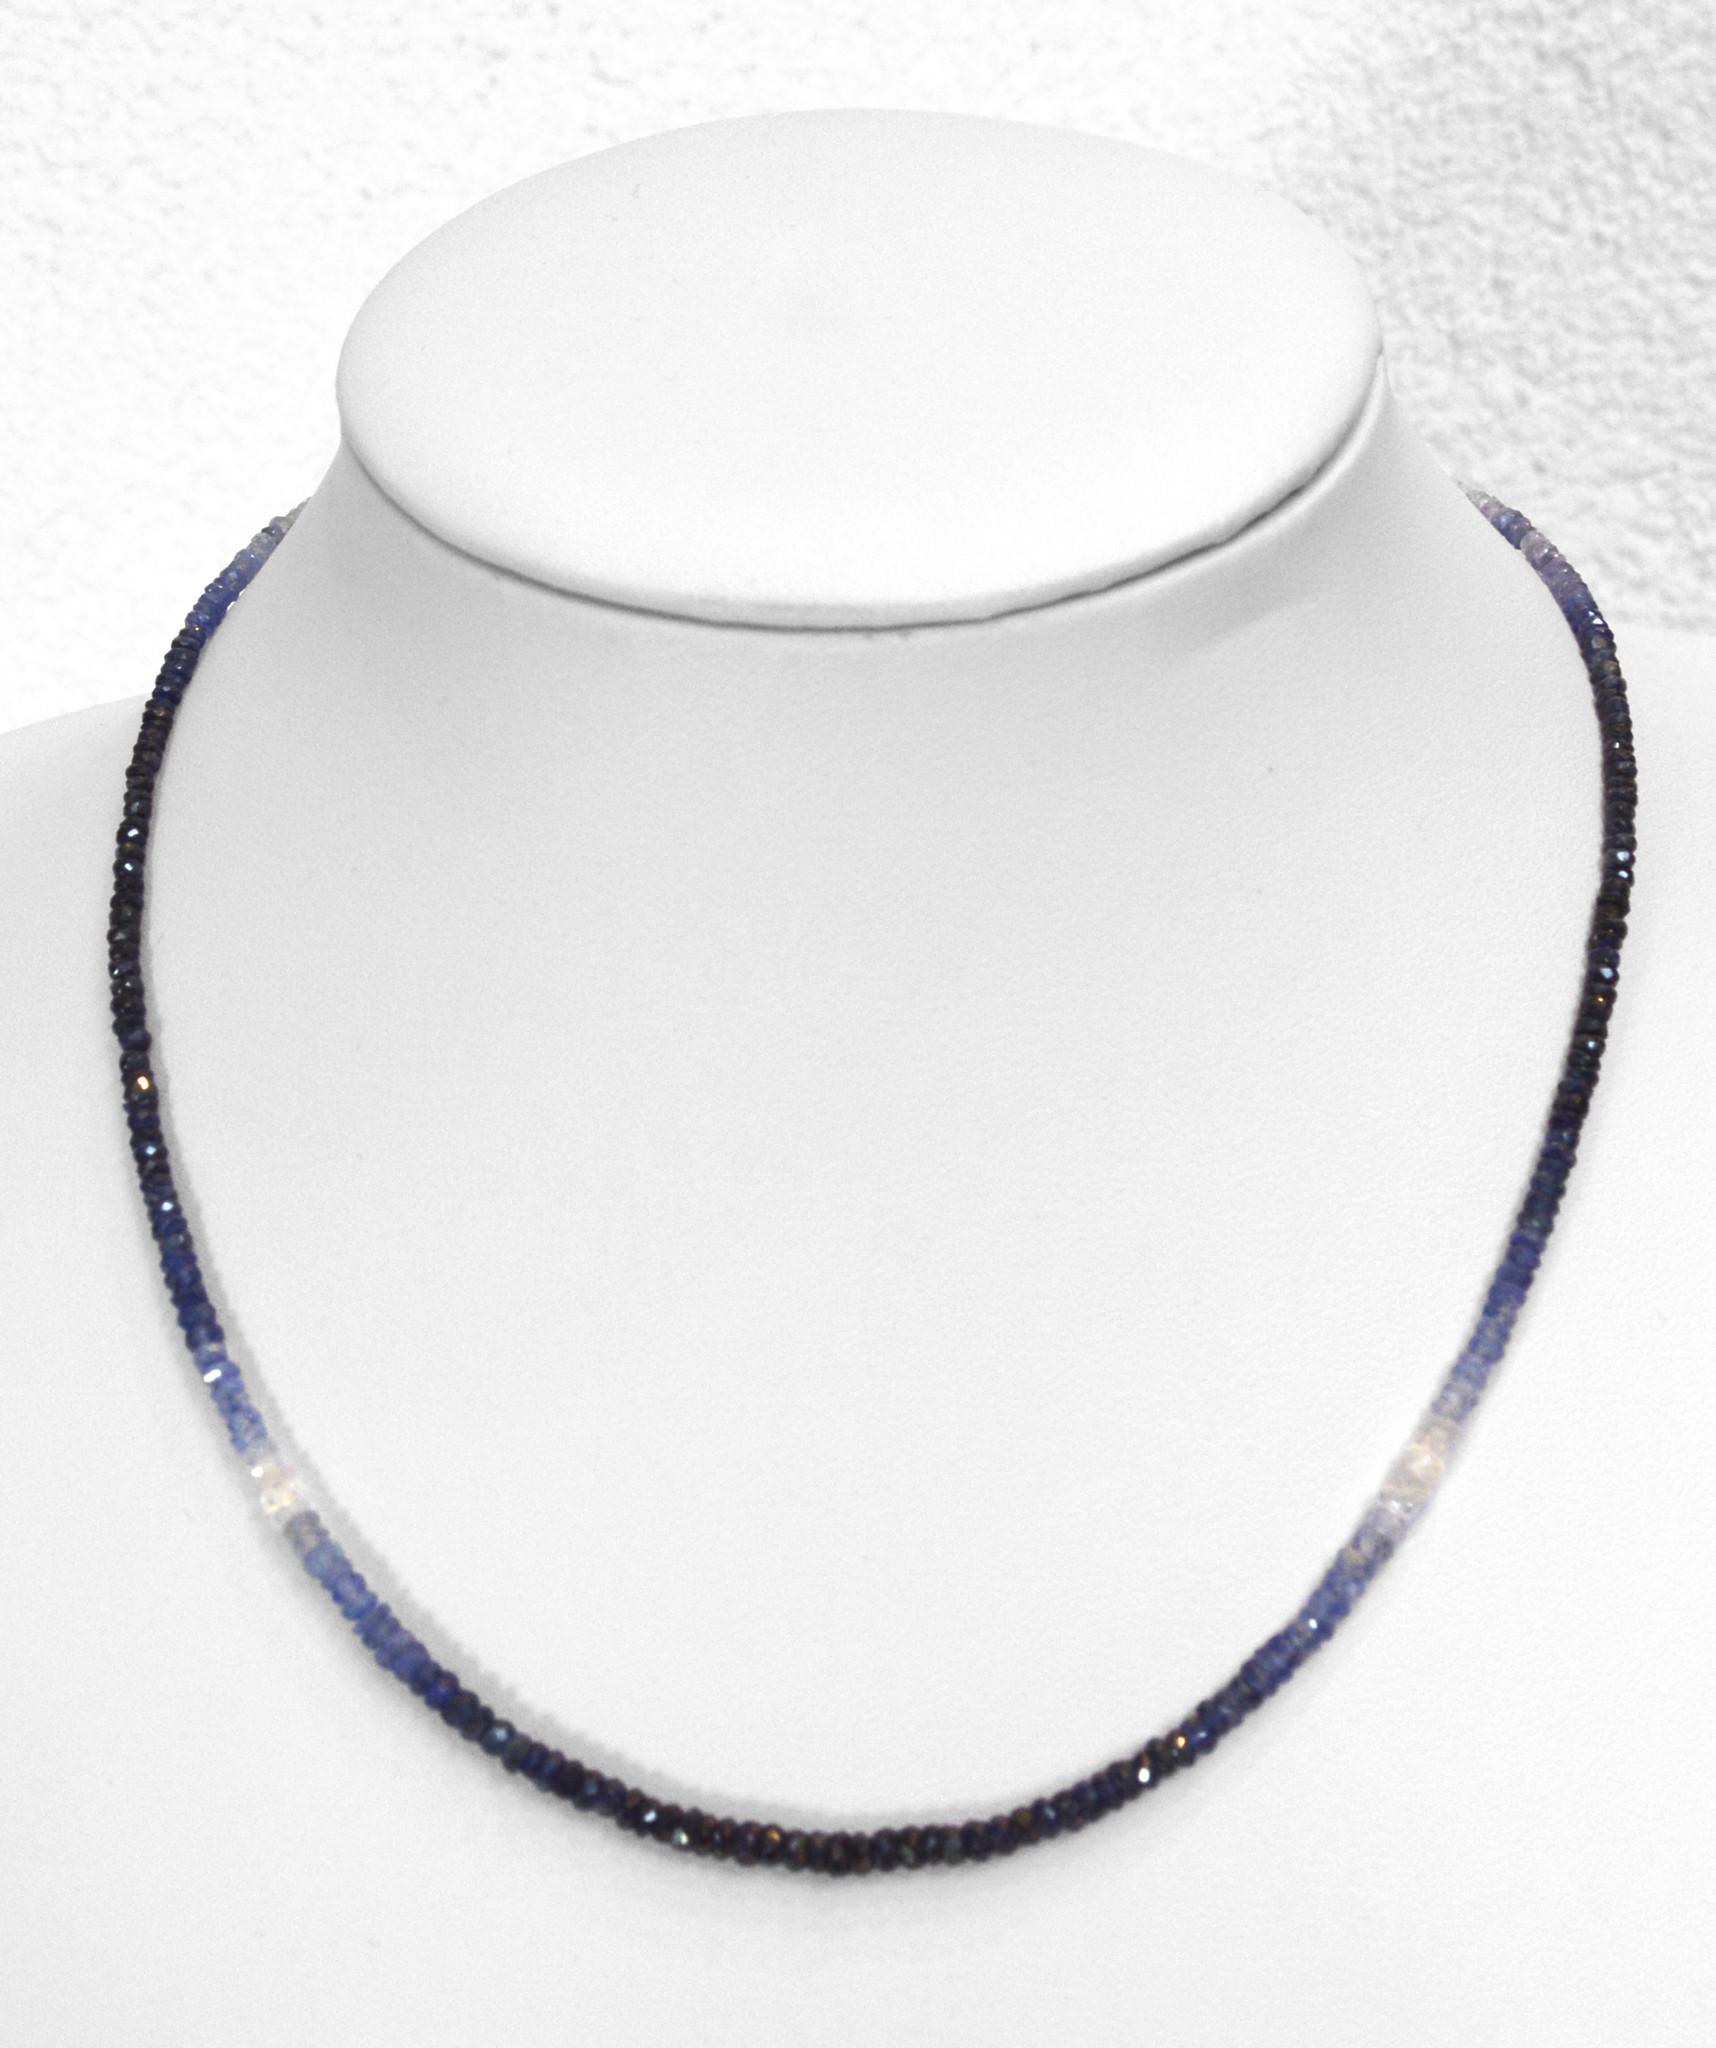 Saphir Blau Kugelkette